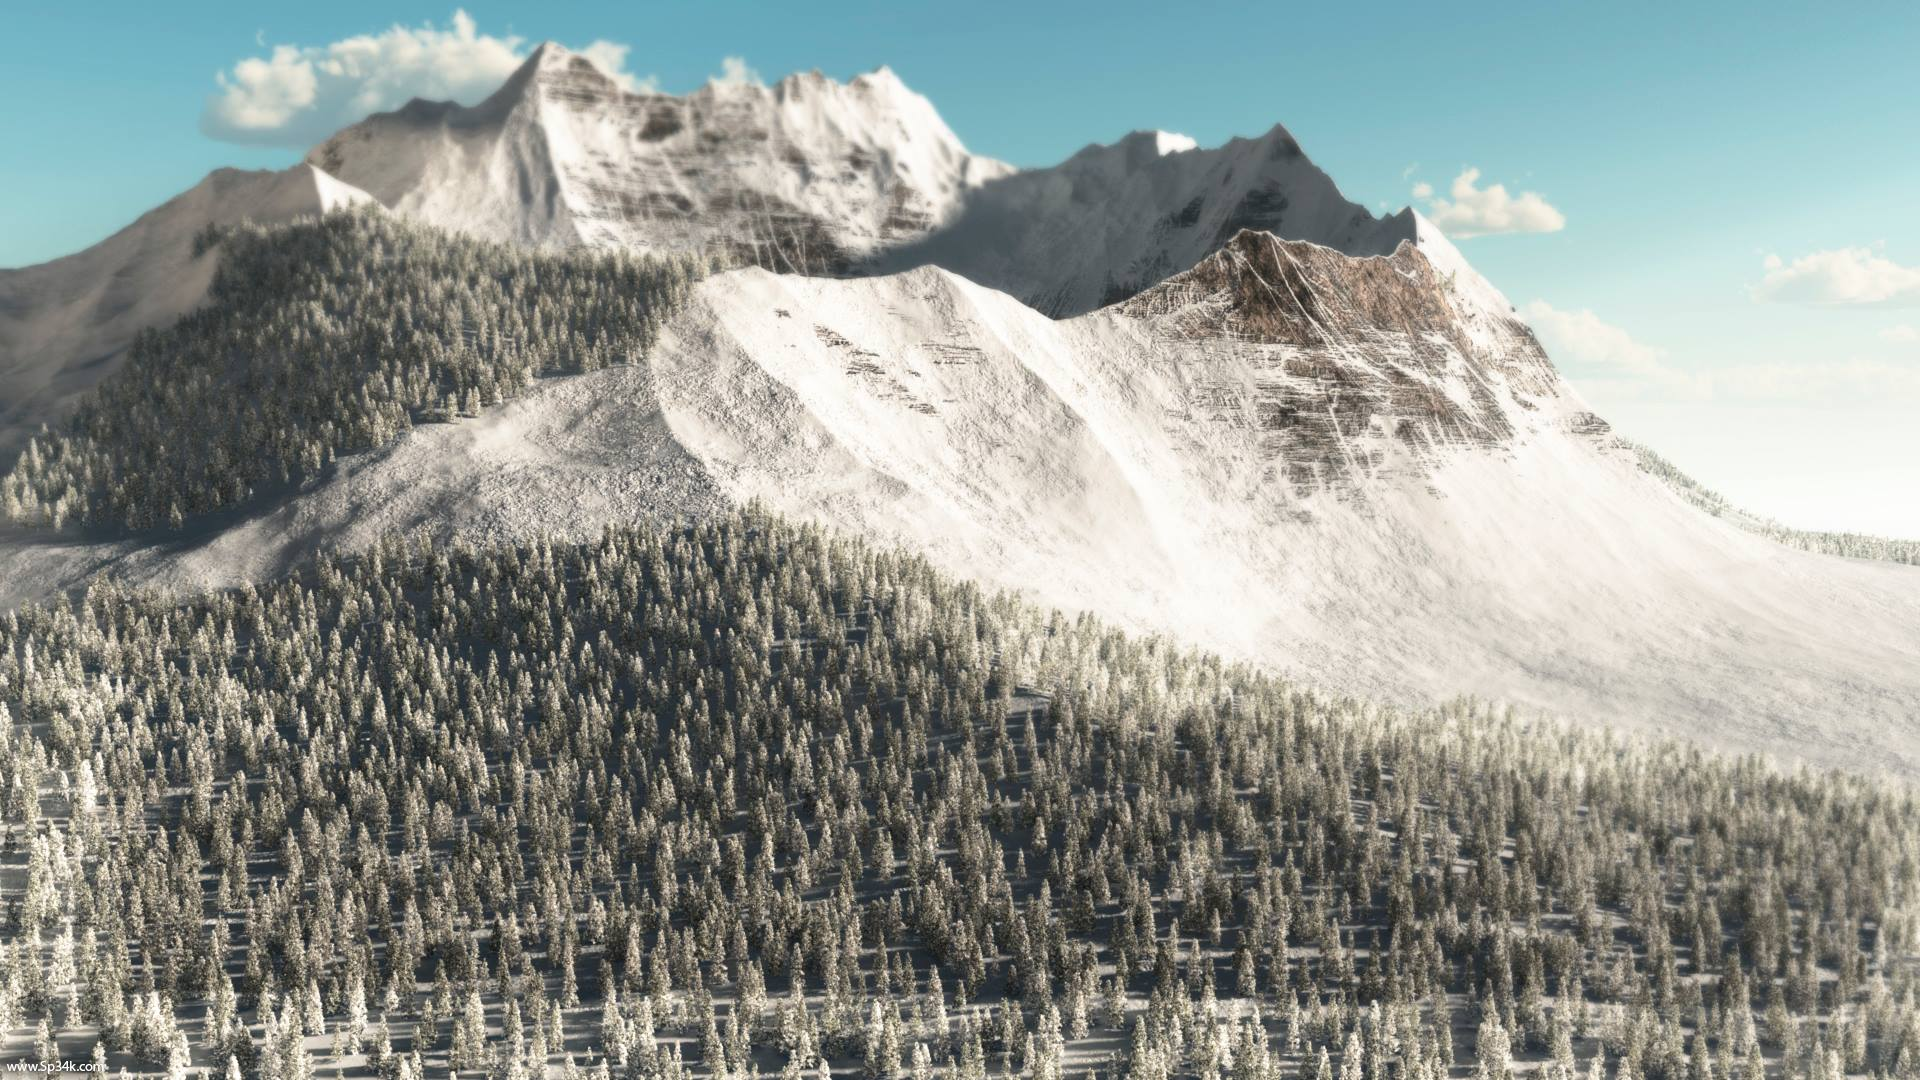 Snowy Mountain by 5p34k